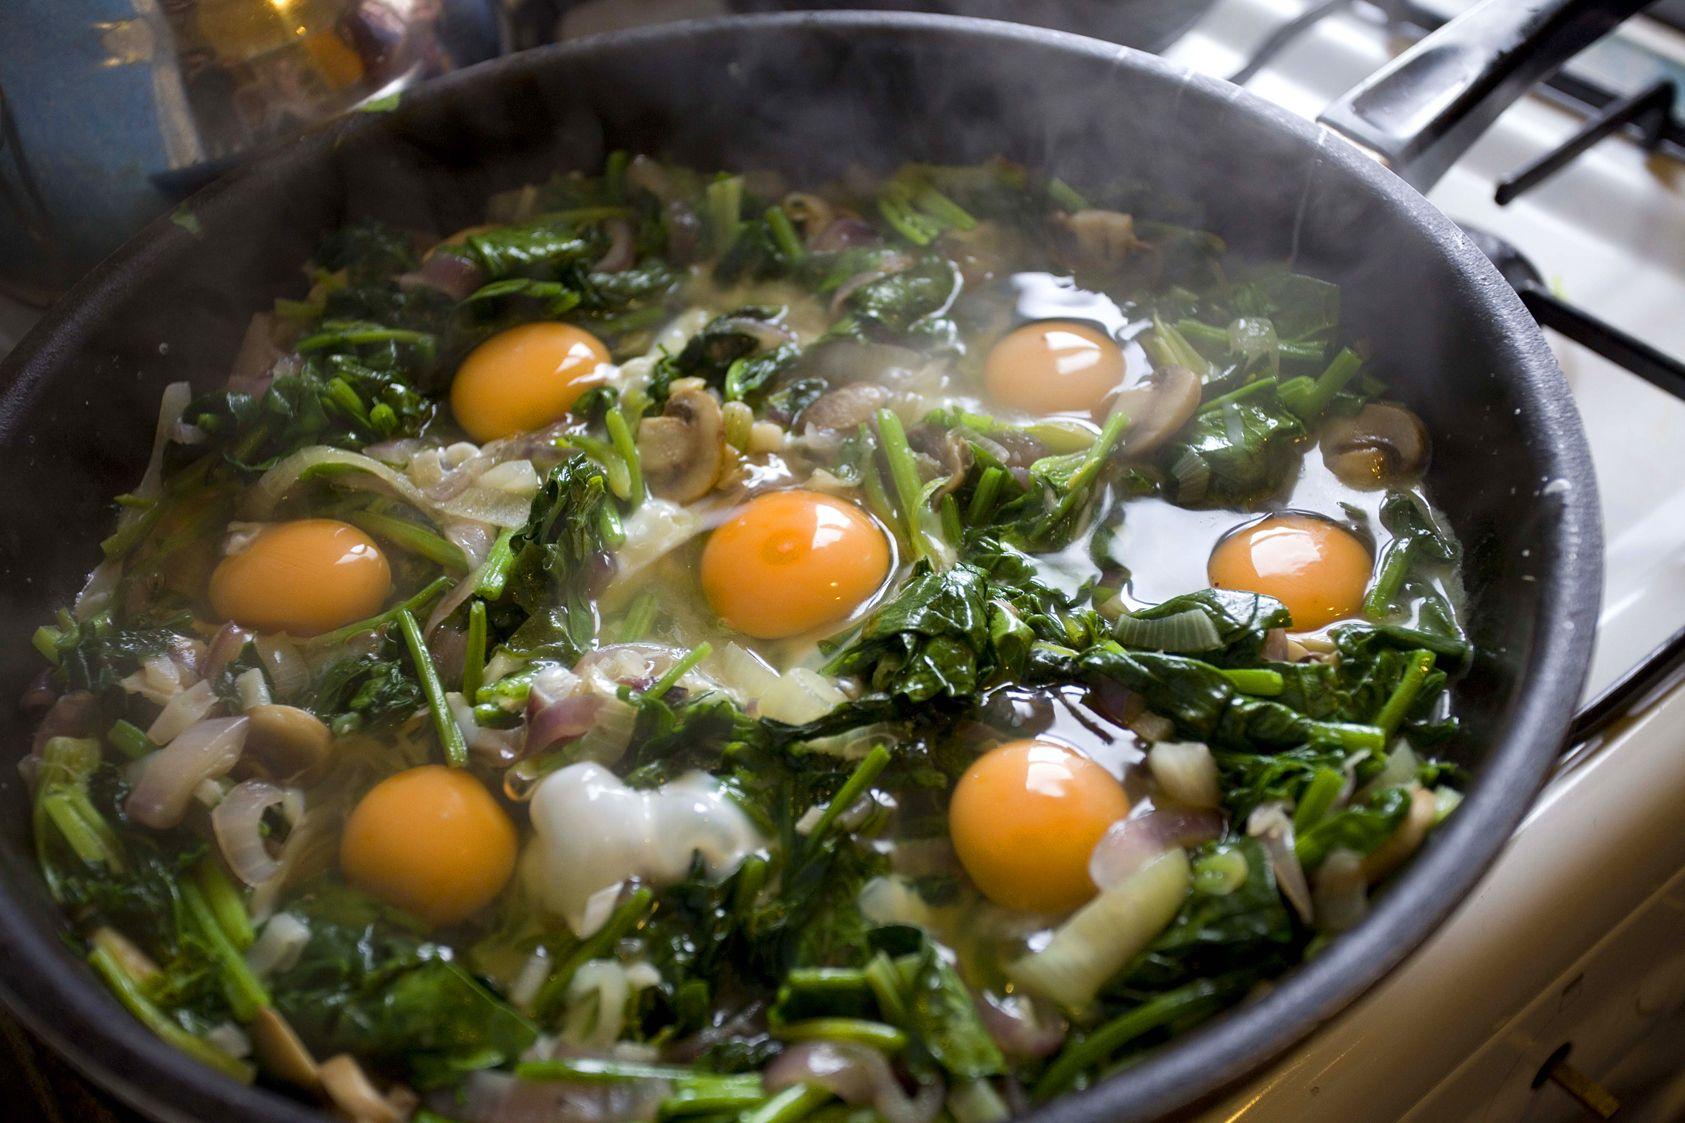 Spinach and onion with eggs ispanak oturtma food vegetarian turkish spinach and onion with eggs ispanak oturtma recipe sbs food forumfinder Choice Image